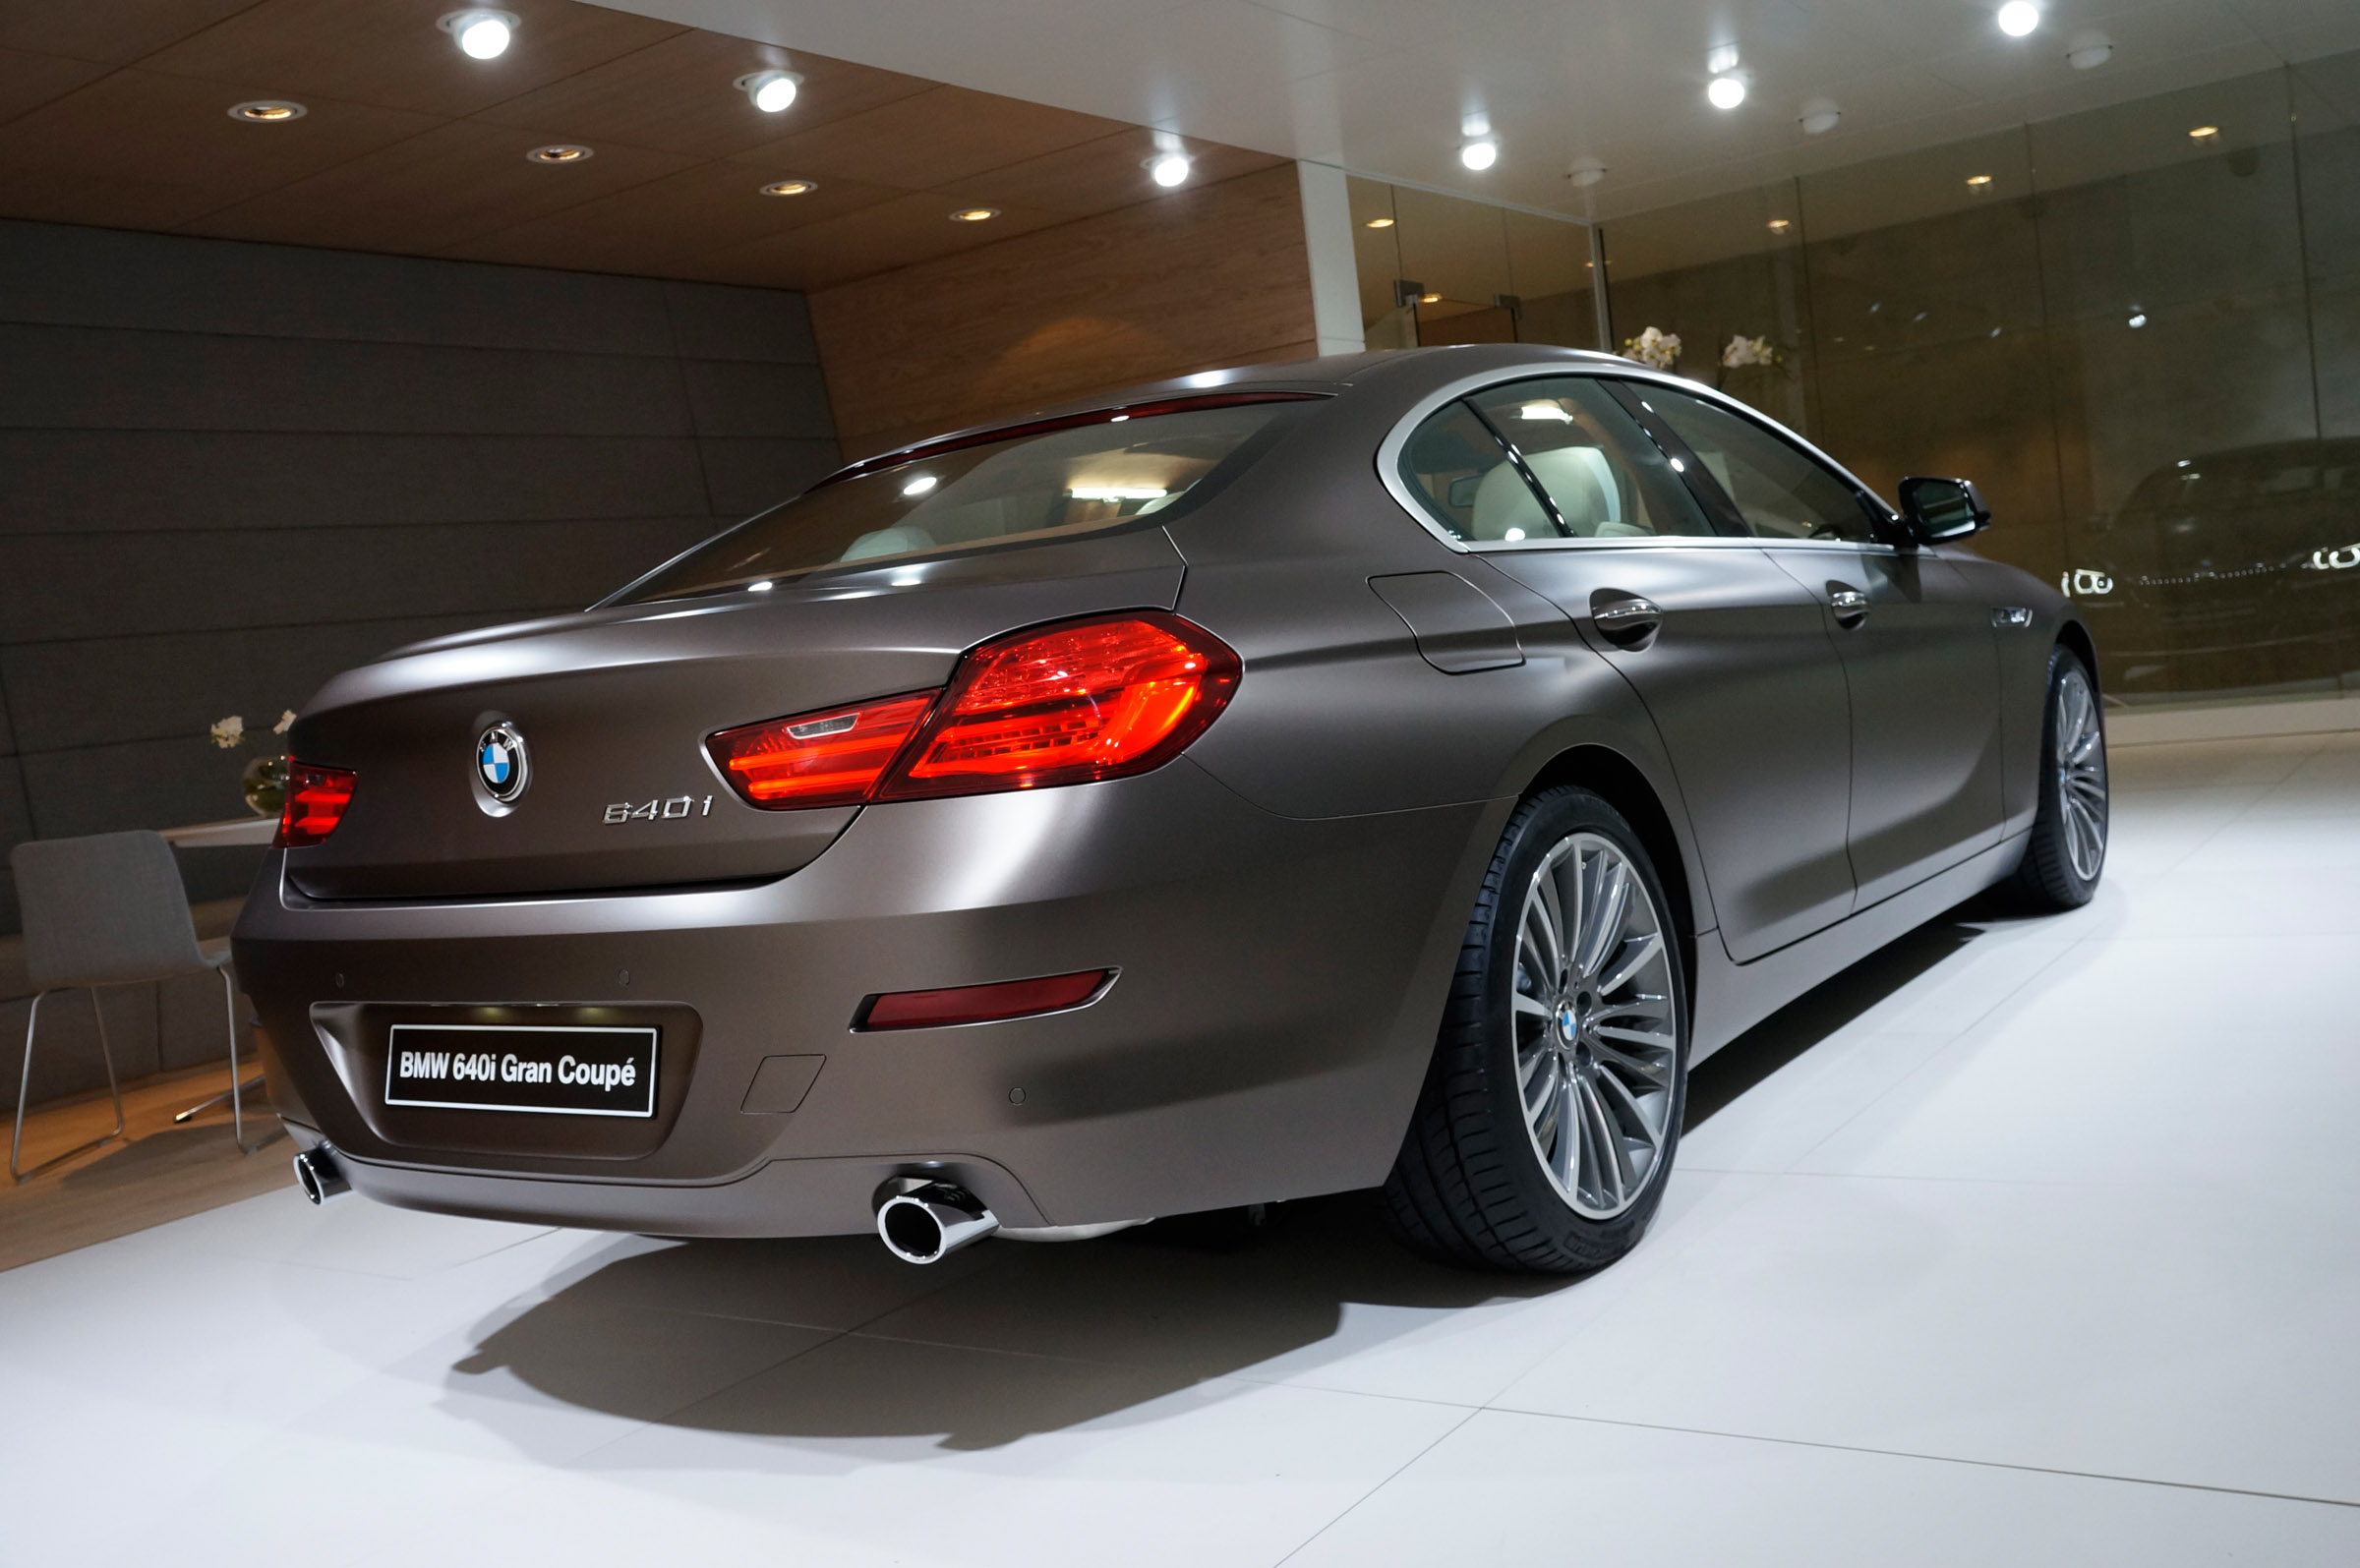 2012 Geneva Motor Show: BMW 6-series Gran Coupe